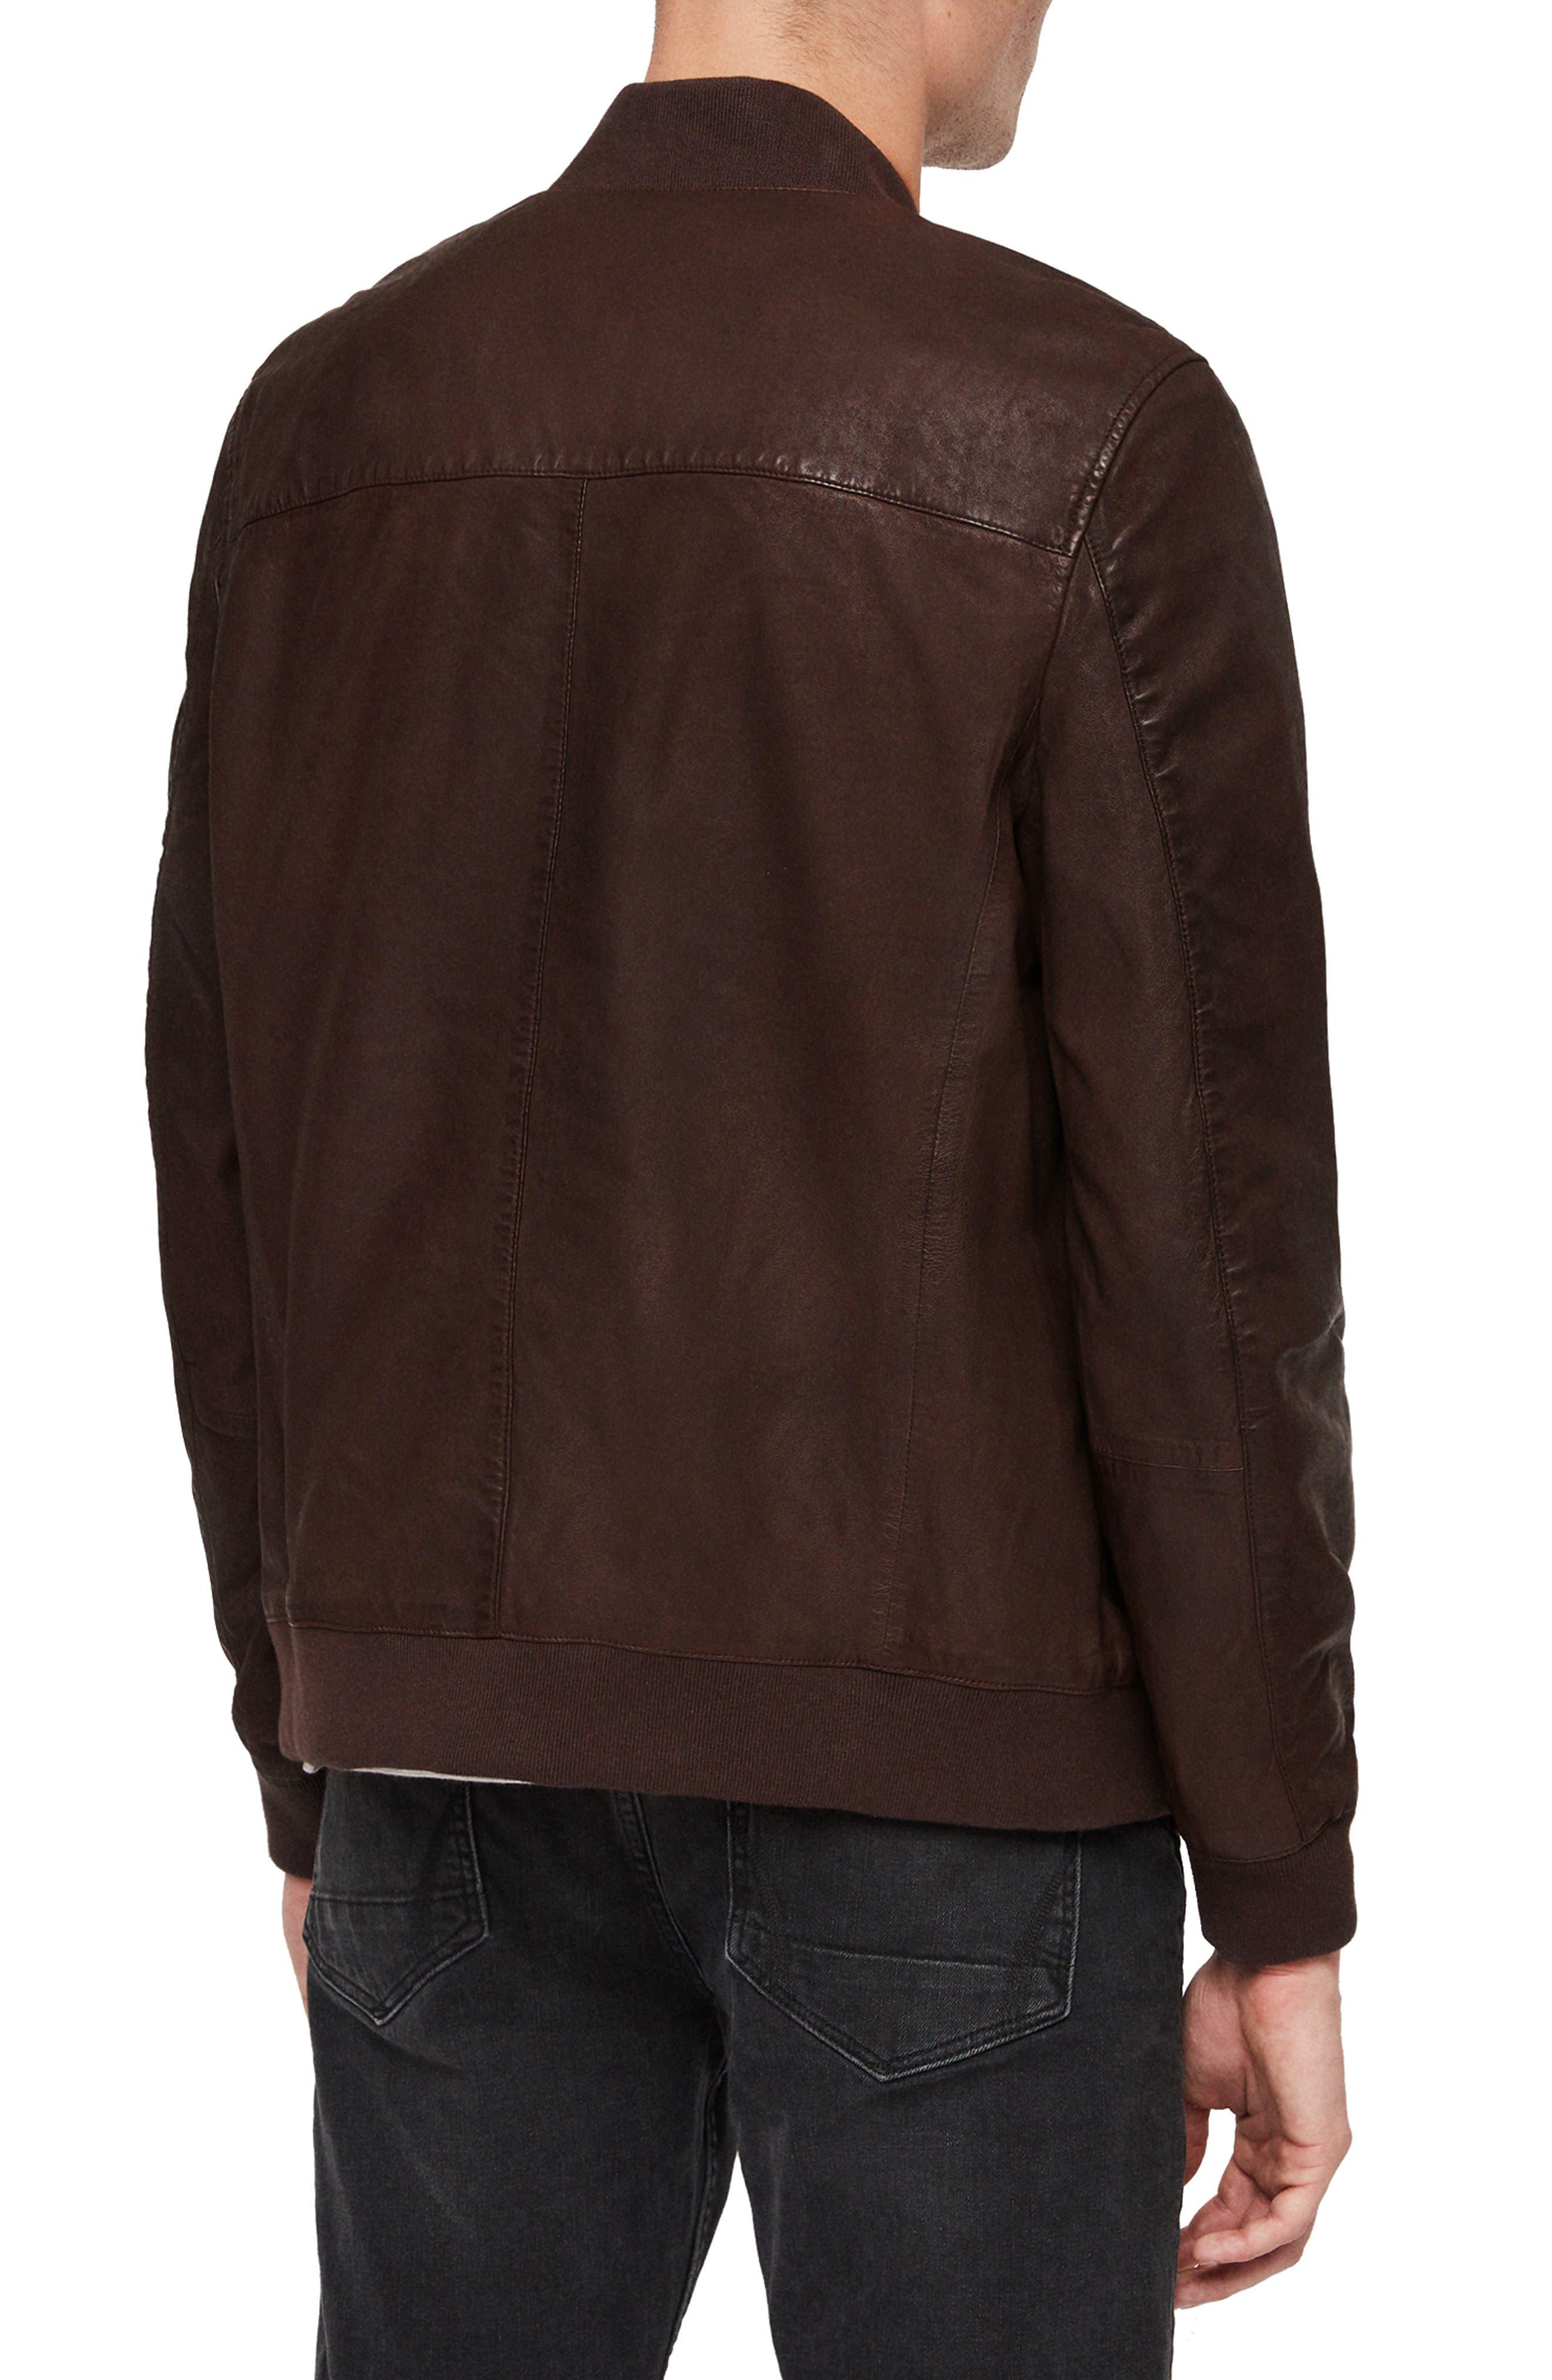 Kino Leather Bomber Jacket,                             Alternate thumbnail 2, color,                             OXBLOOD